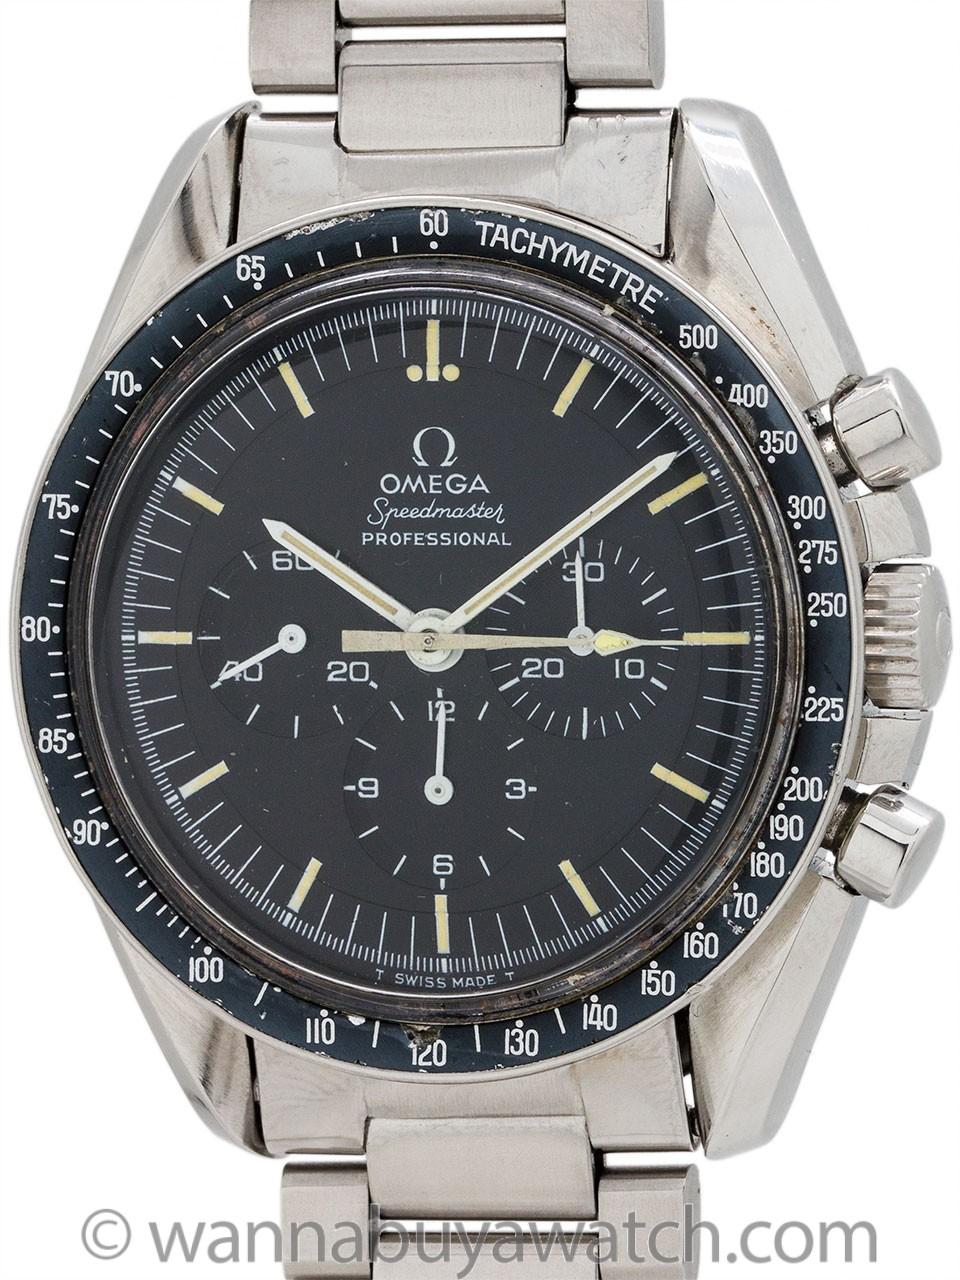 Omega Speedmaster Premoon ref 145.022-69 Calibre 861 circa 1970